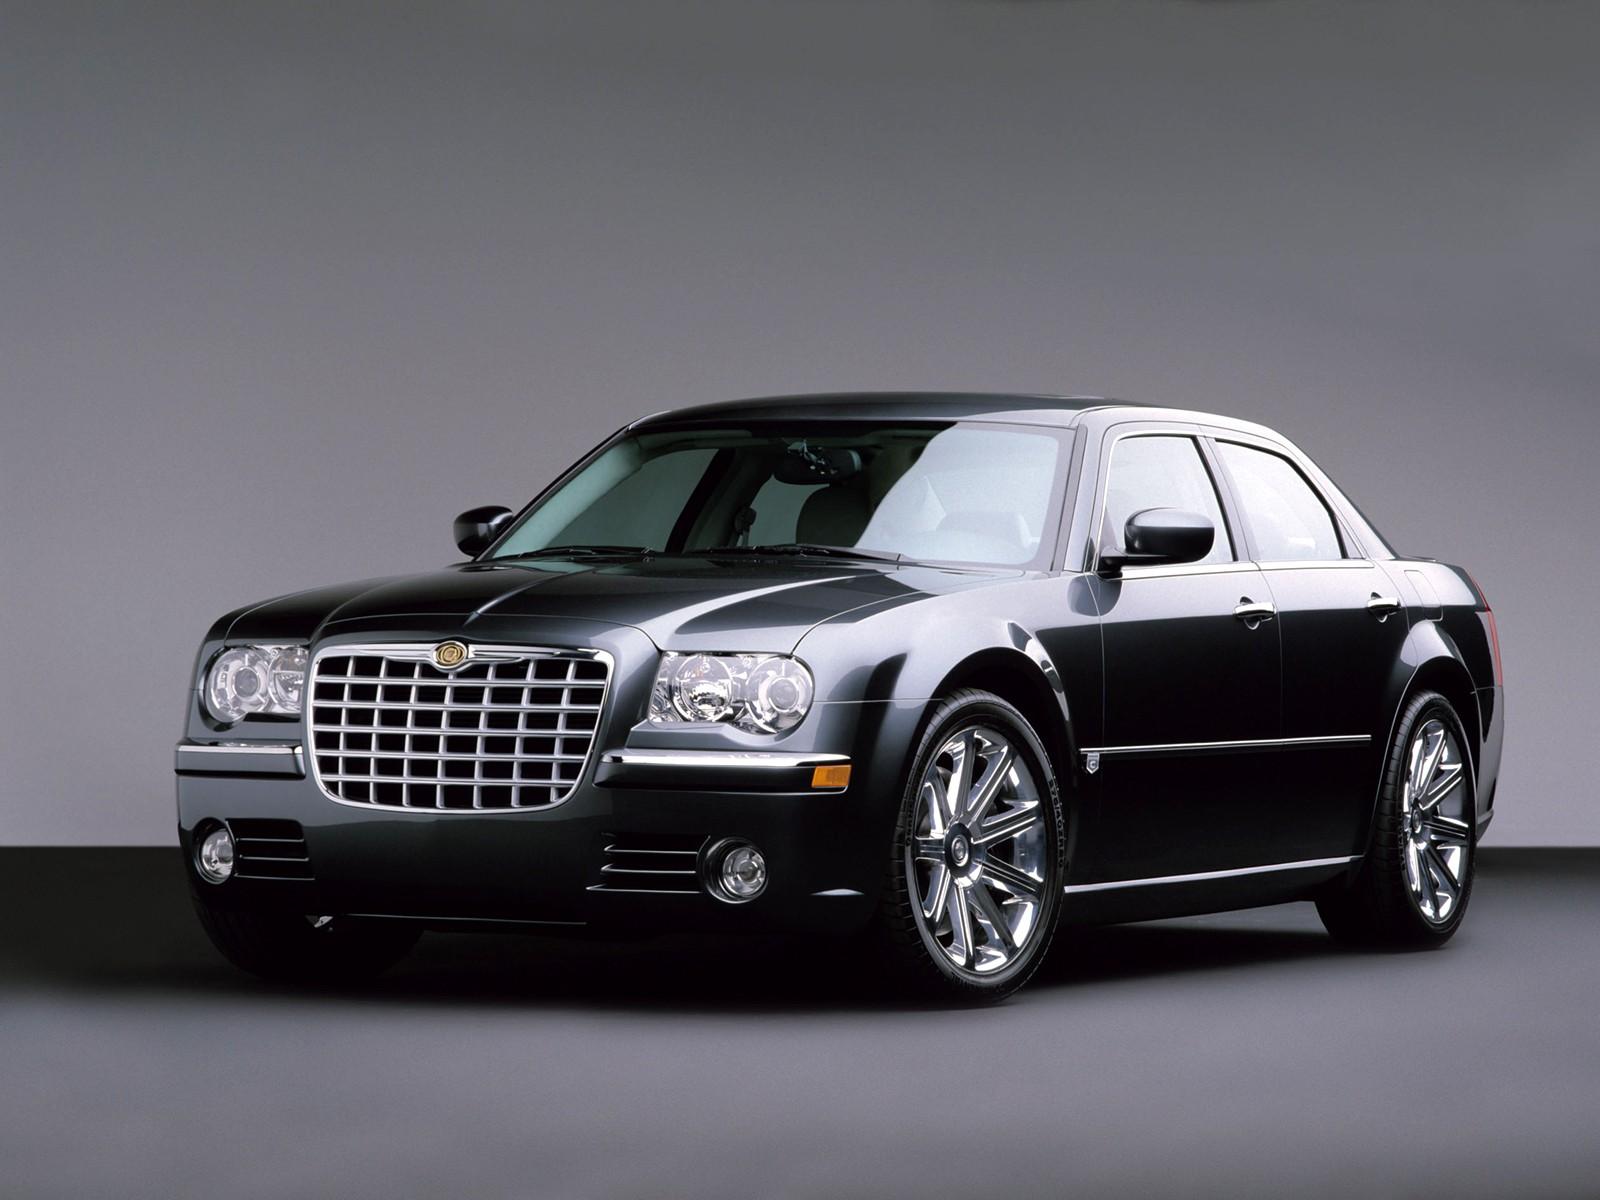 http://www.privatefleet.com.au/images/upload/Image/Chrysler-300C-002.jpg